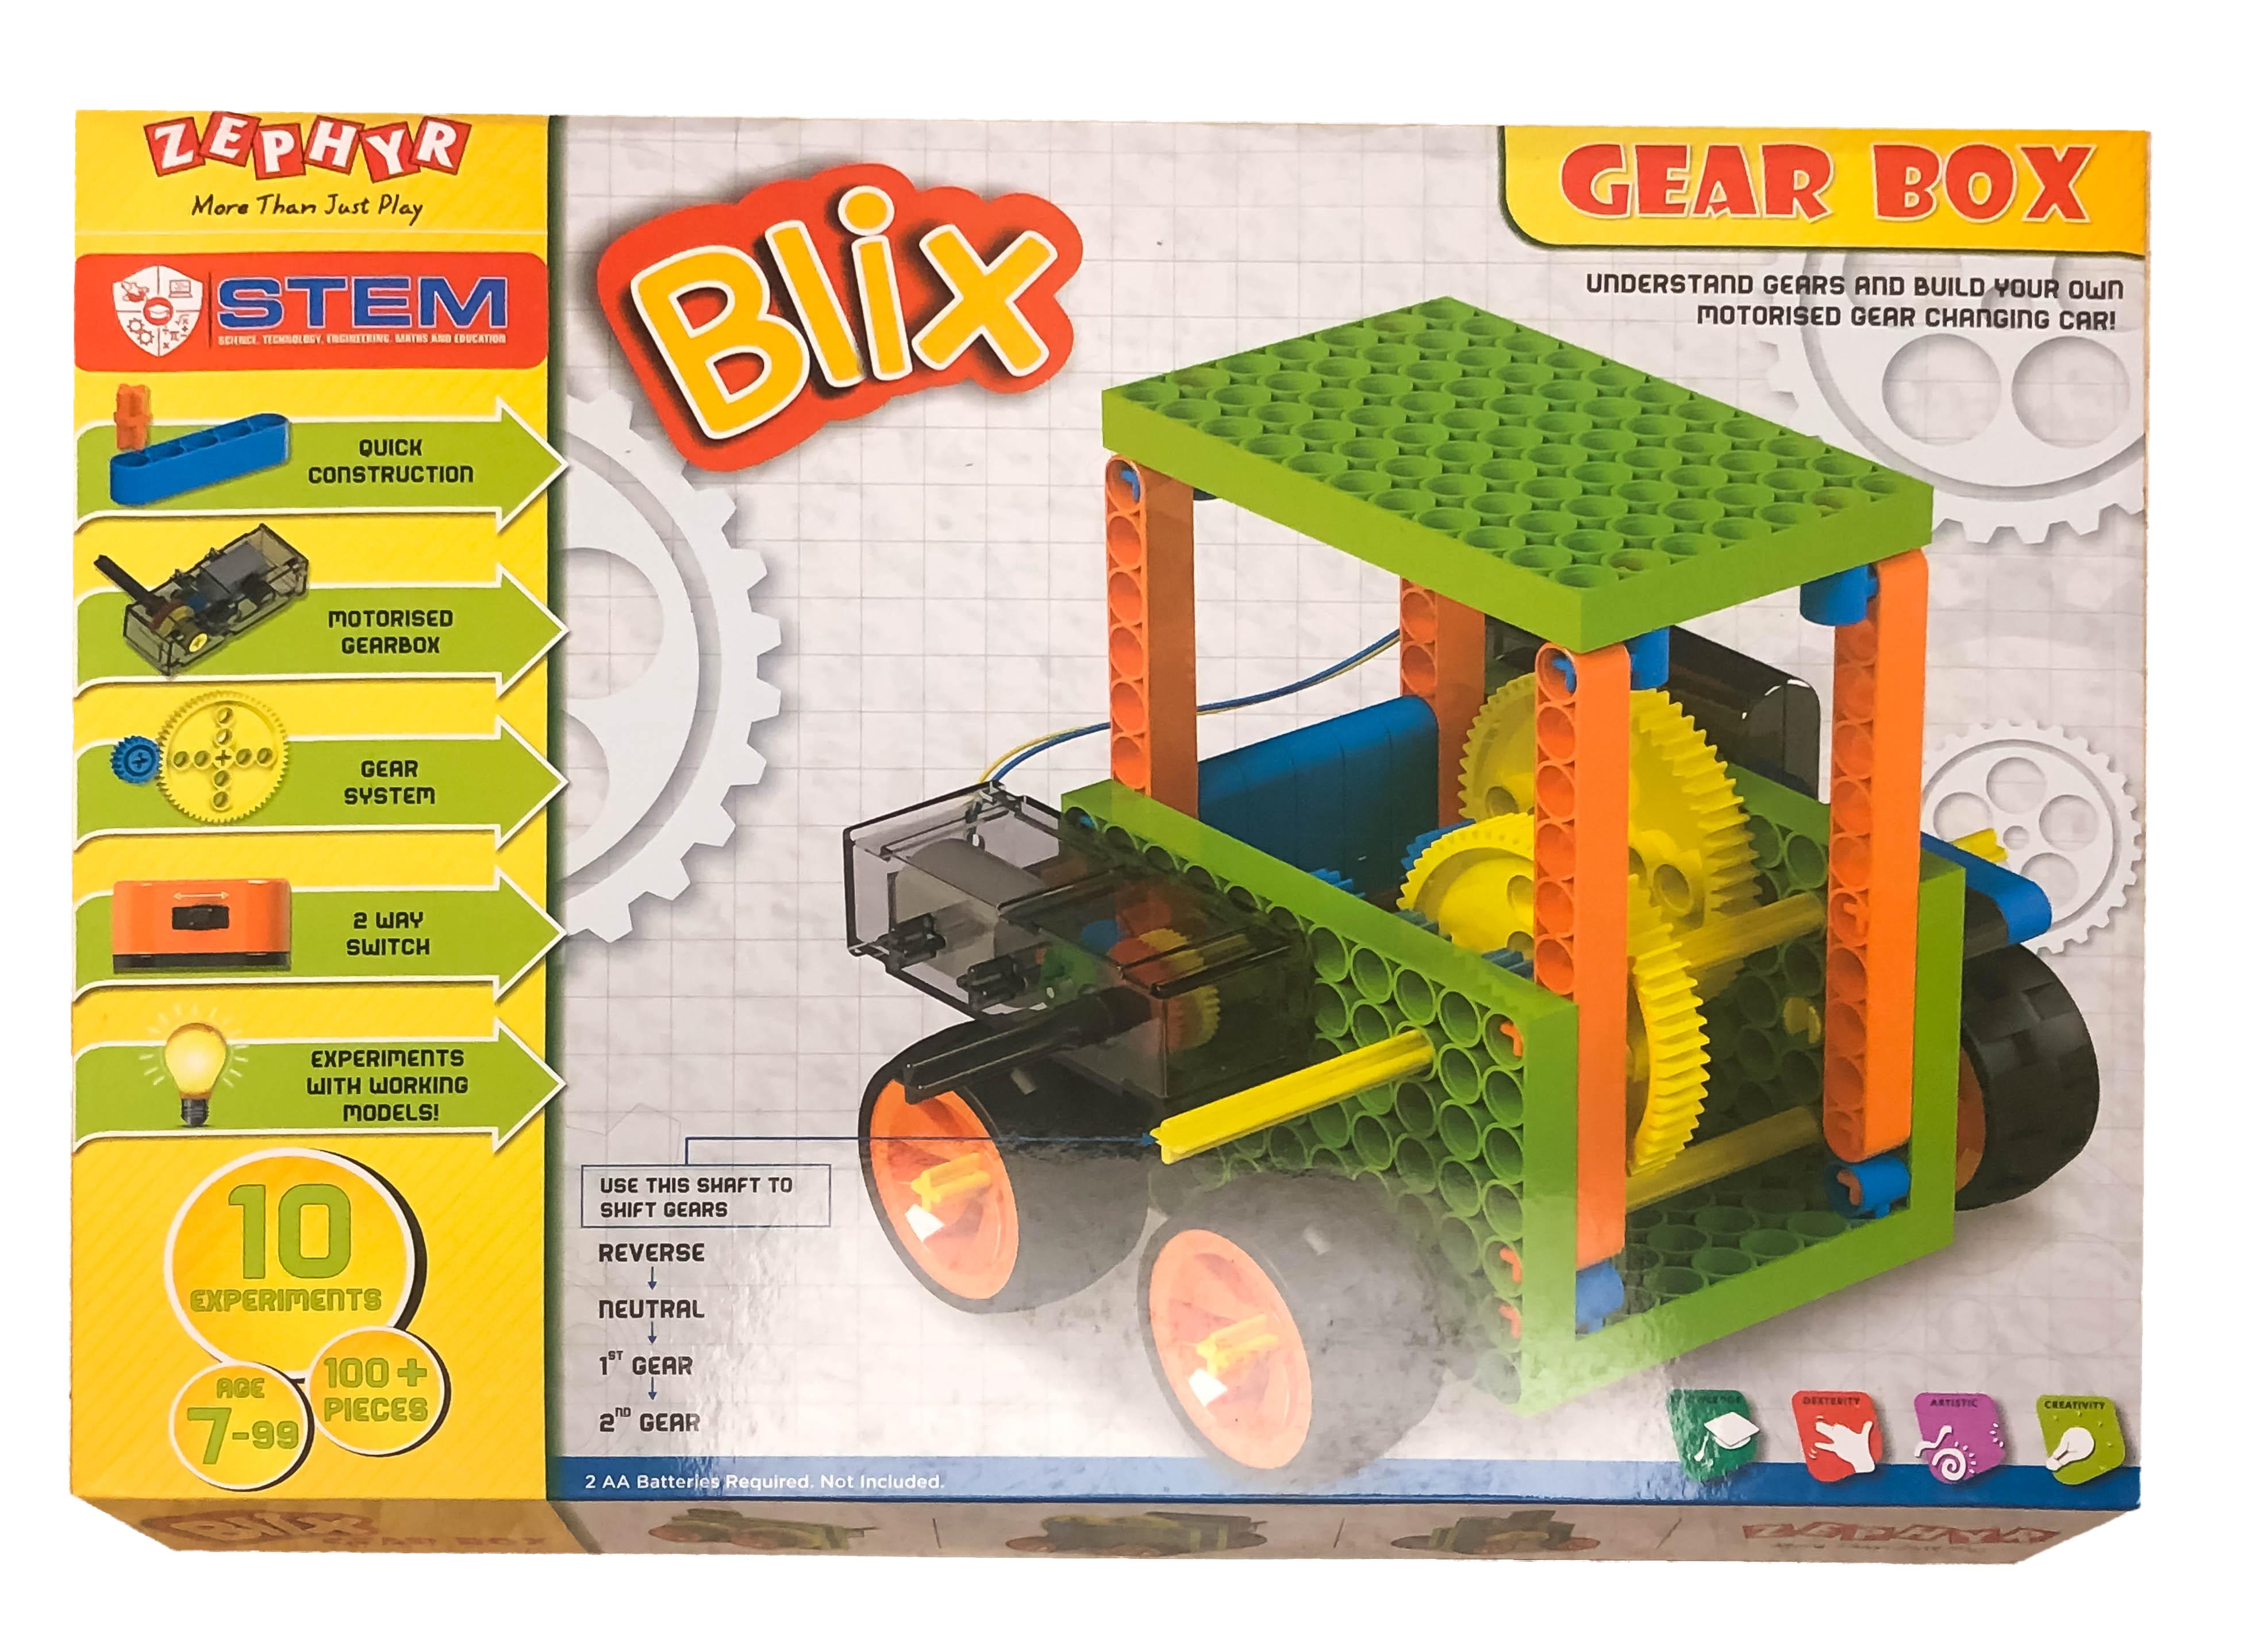 Blix Gear Box